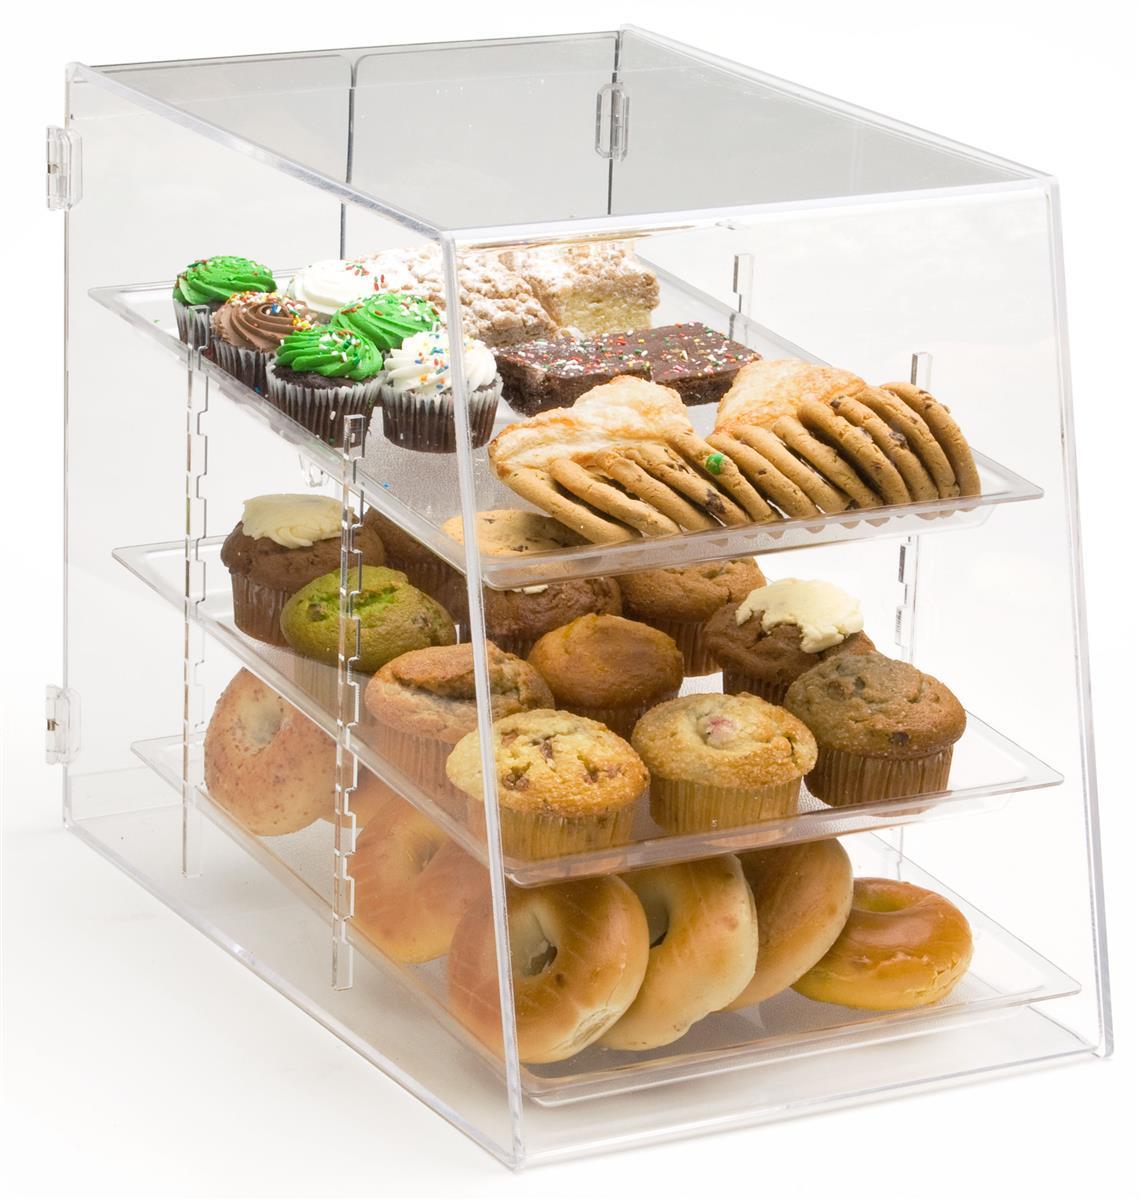 Displays2go Acrylic Food Display Case with (3) Trays